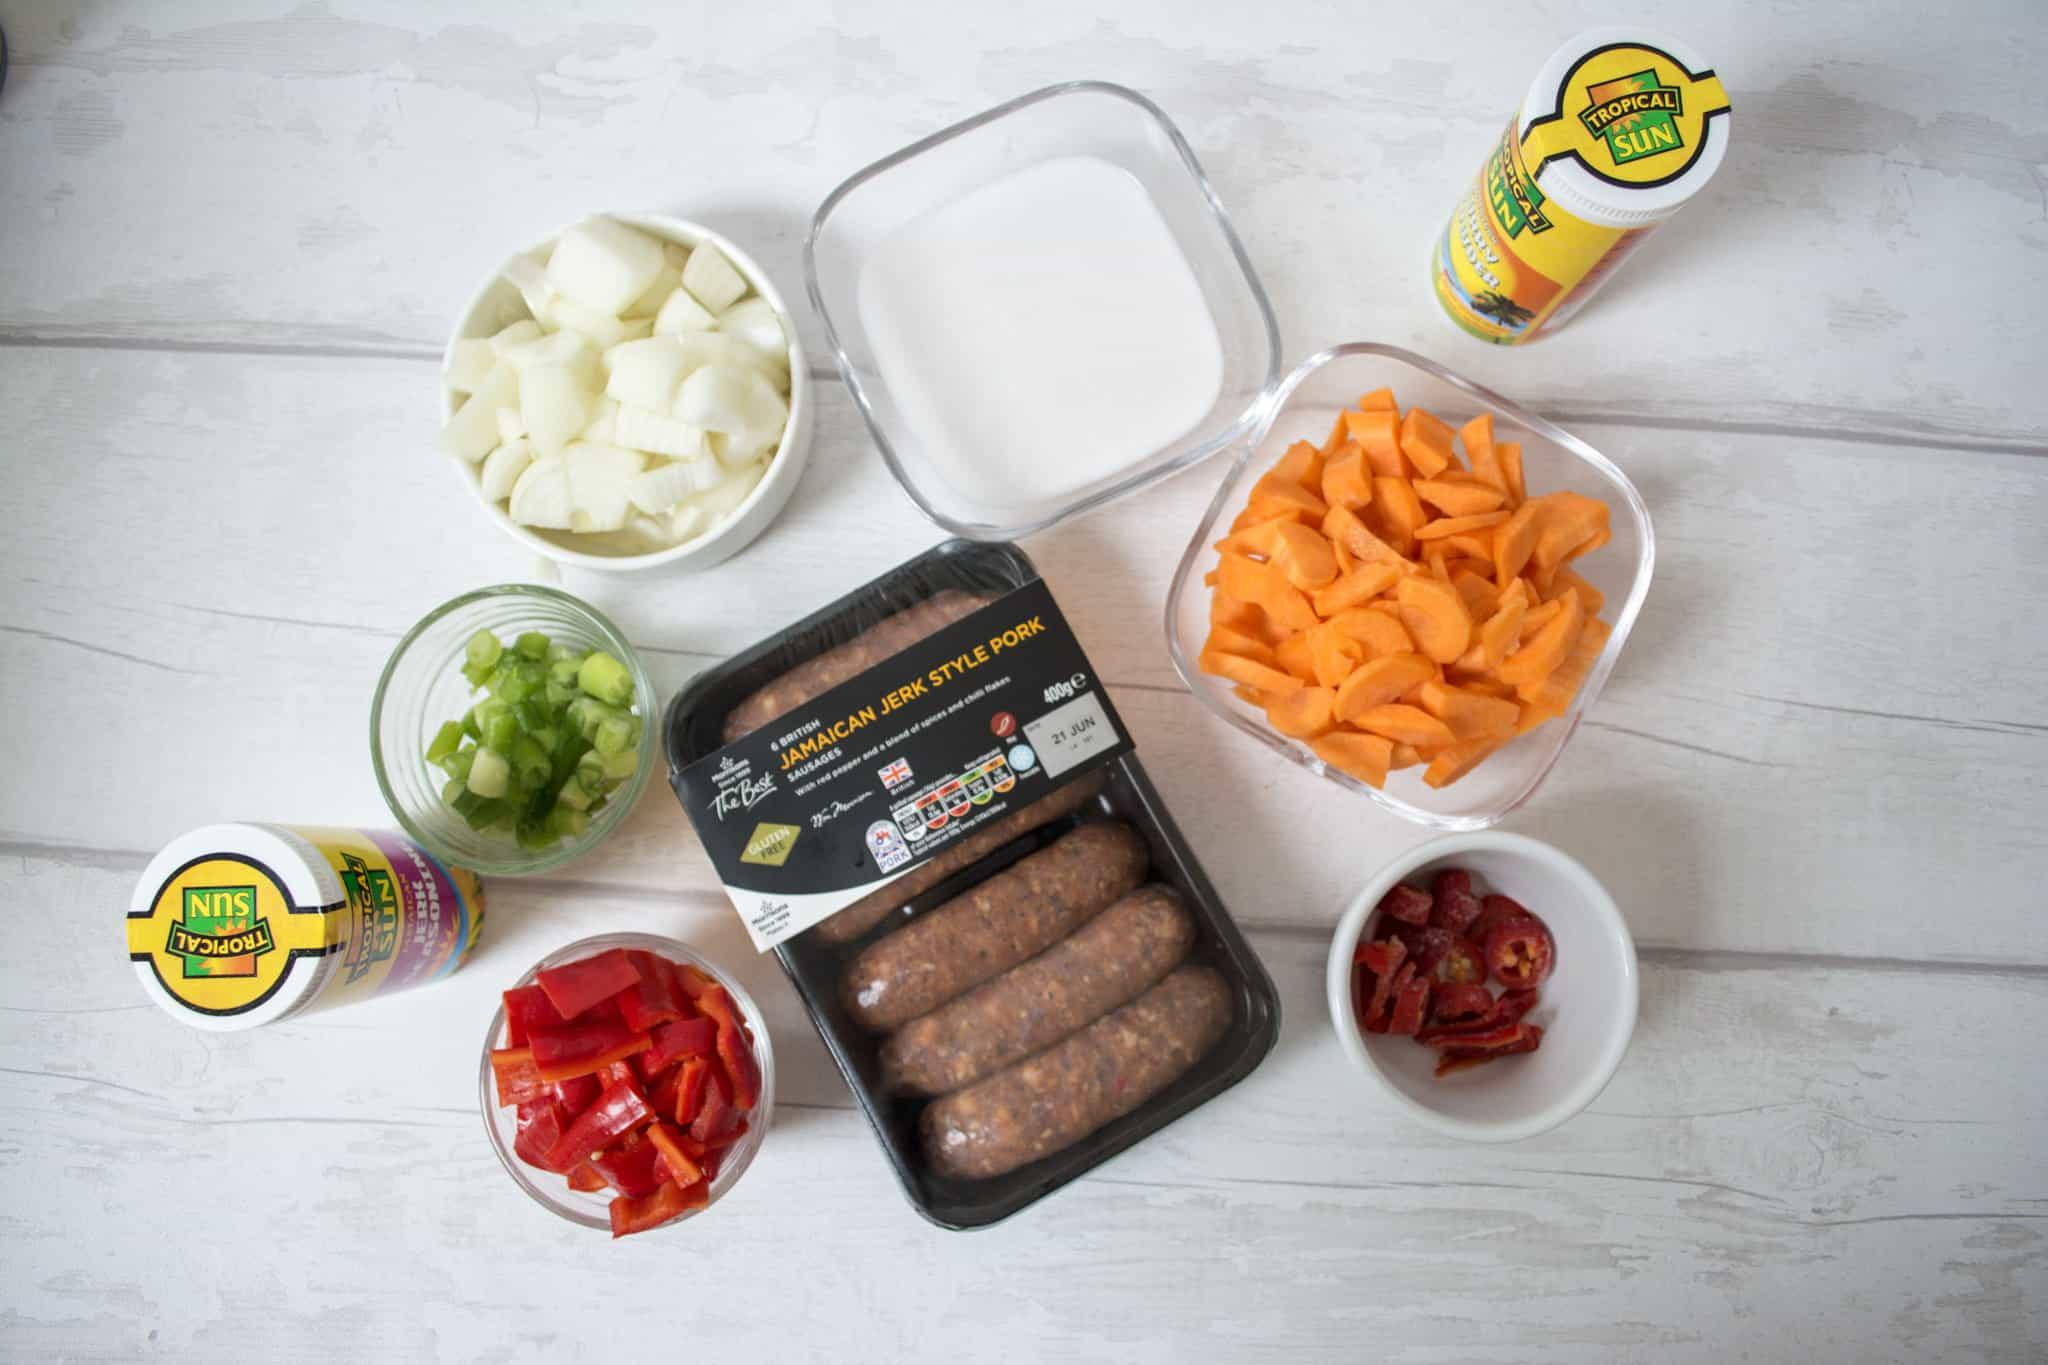 Sausage jerk ingredients